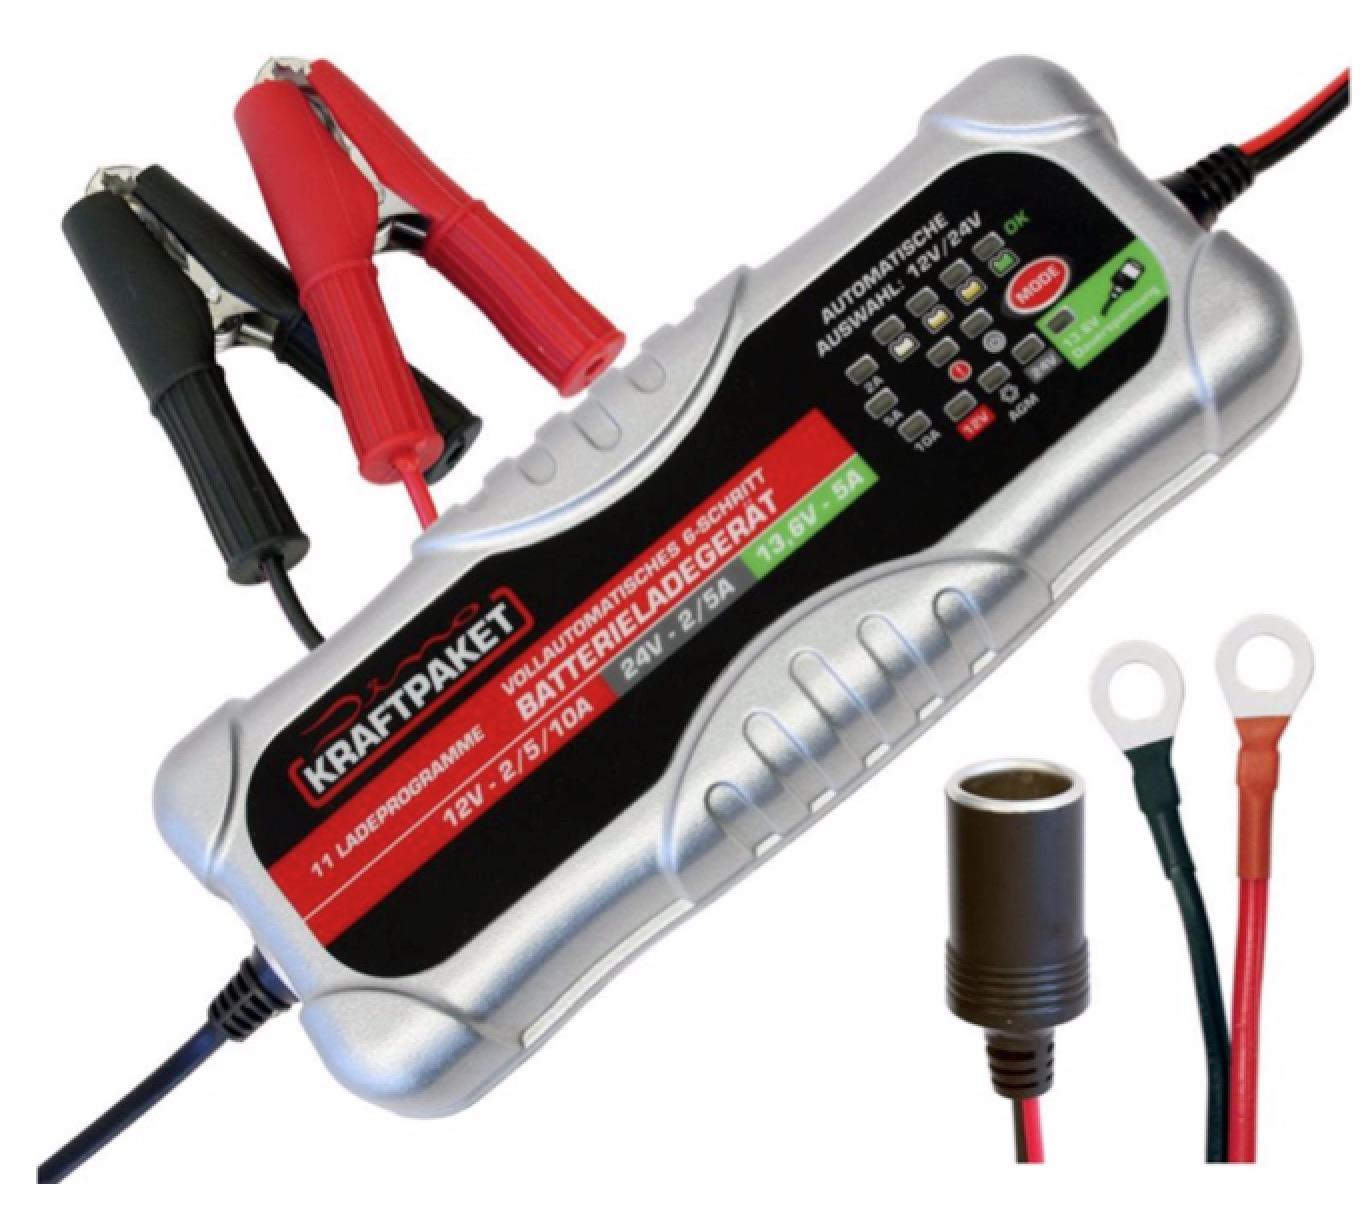 Dino 136302 Kraftpaket 12/24 V 10 A Auto-Batterieladegerät für nur 59,95 Euro inkl. Versand